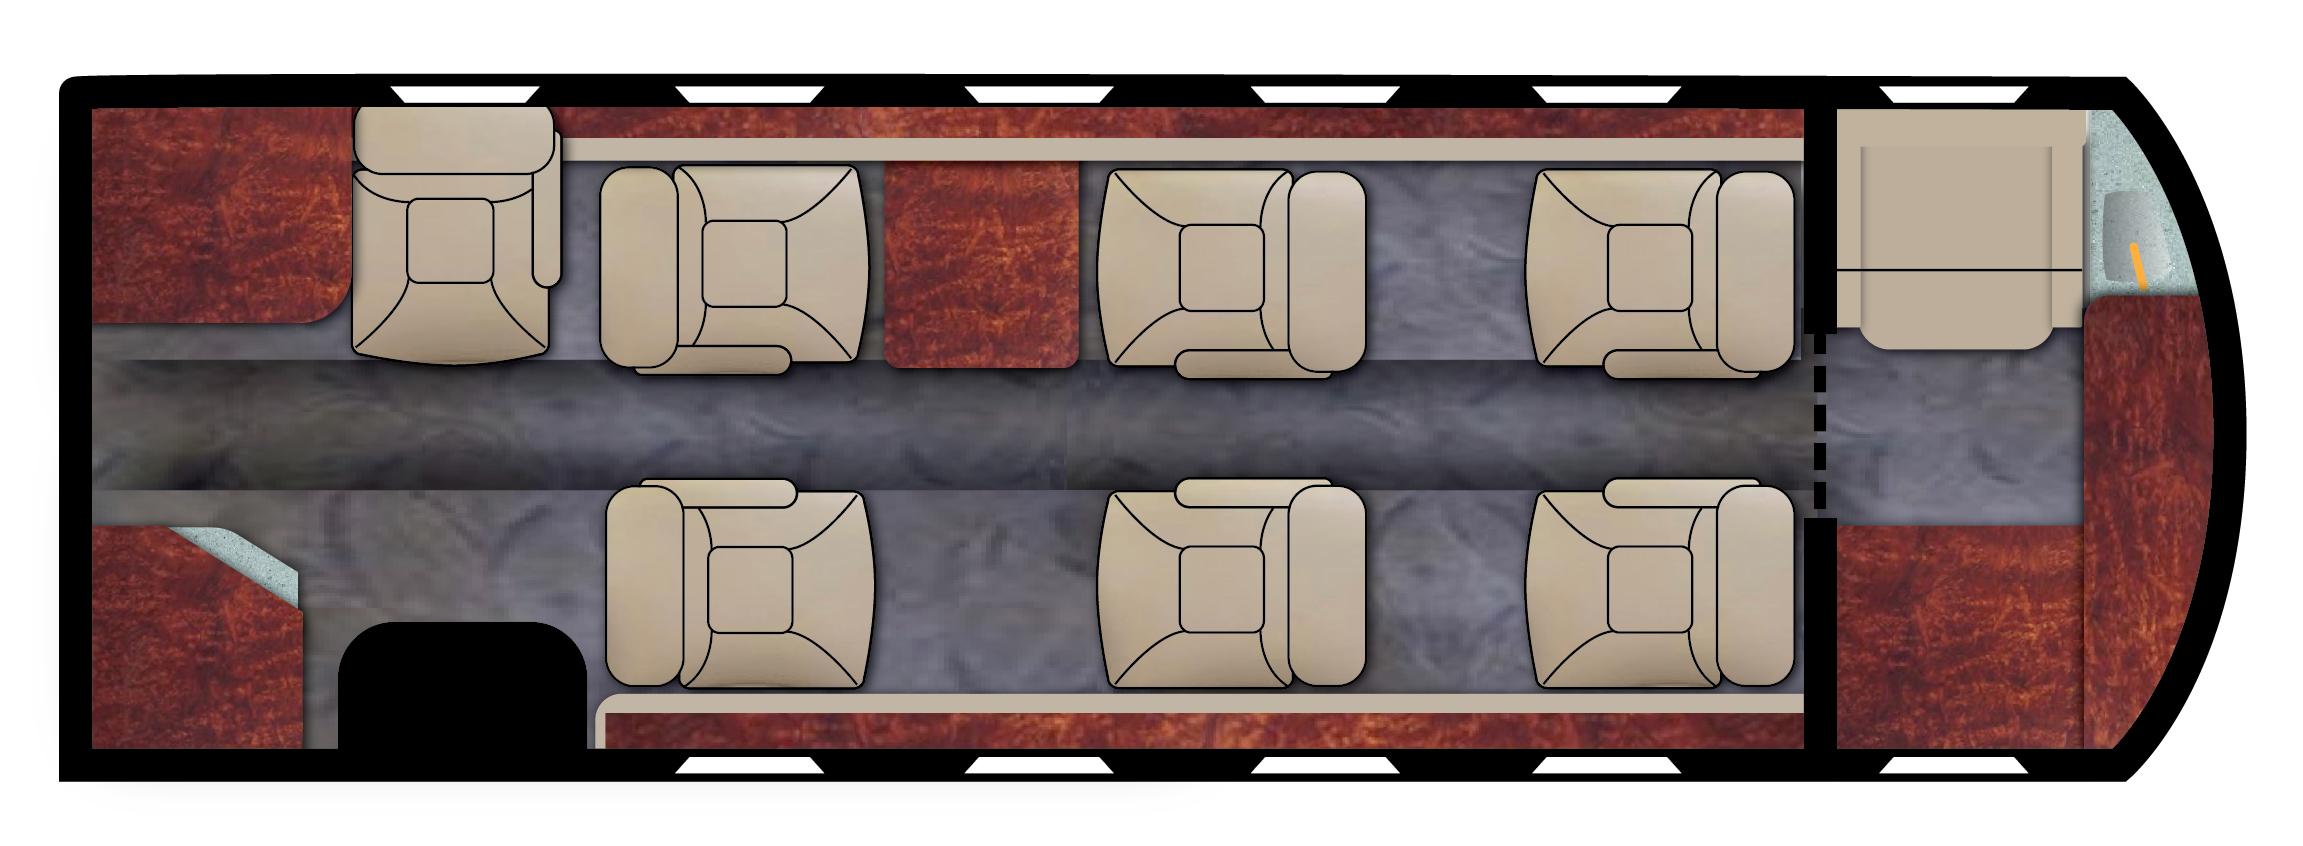 Citation-Excel-Floorplan-01